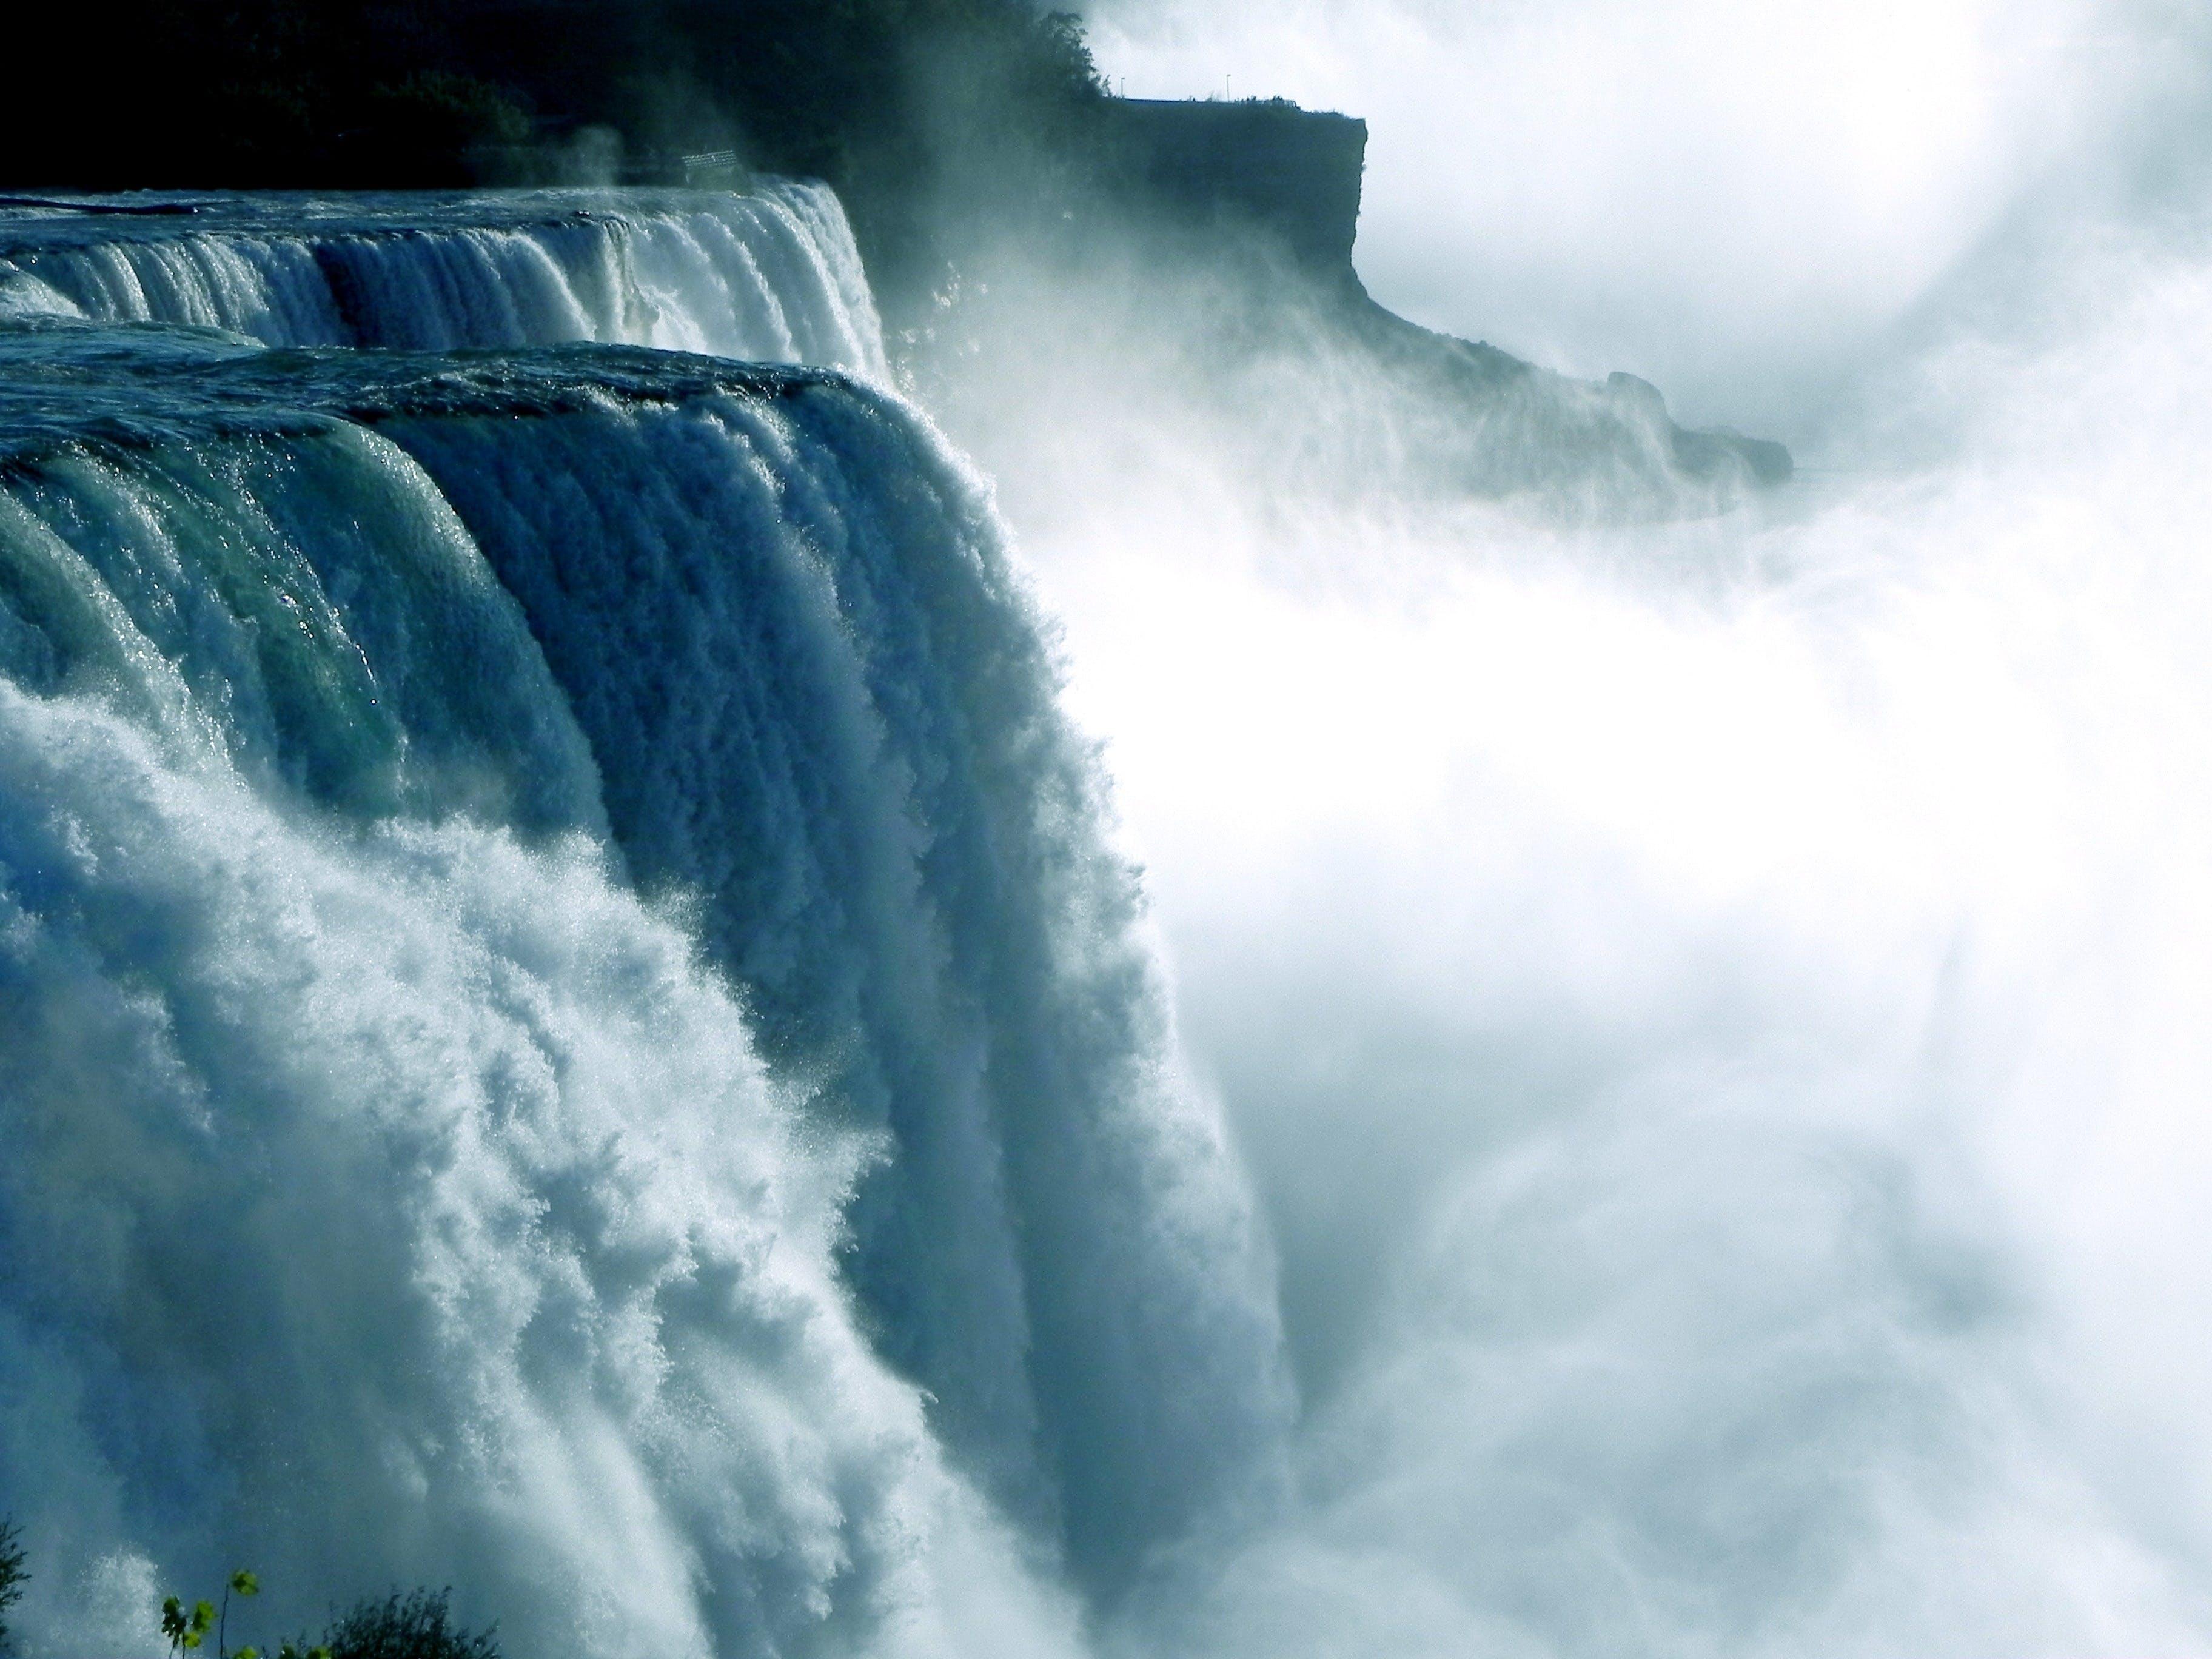 Free stock photo of nature, water, mist, waterfall